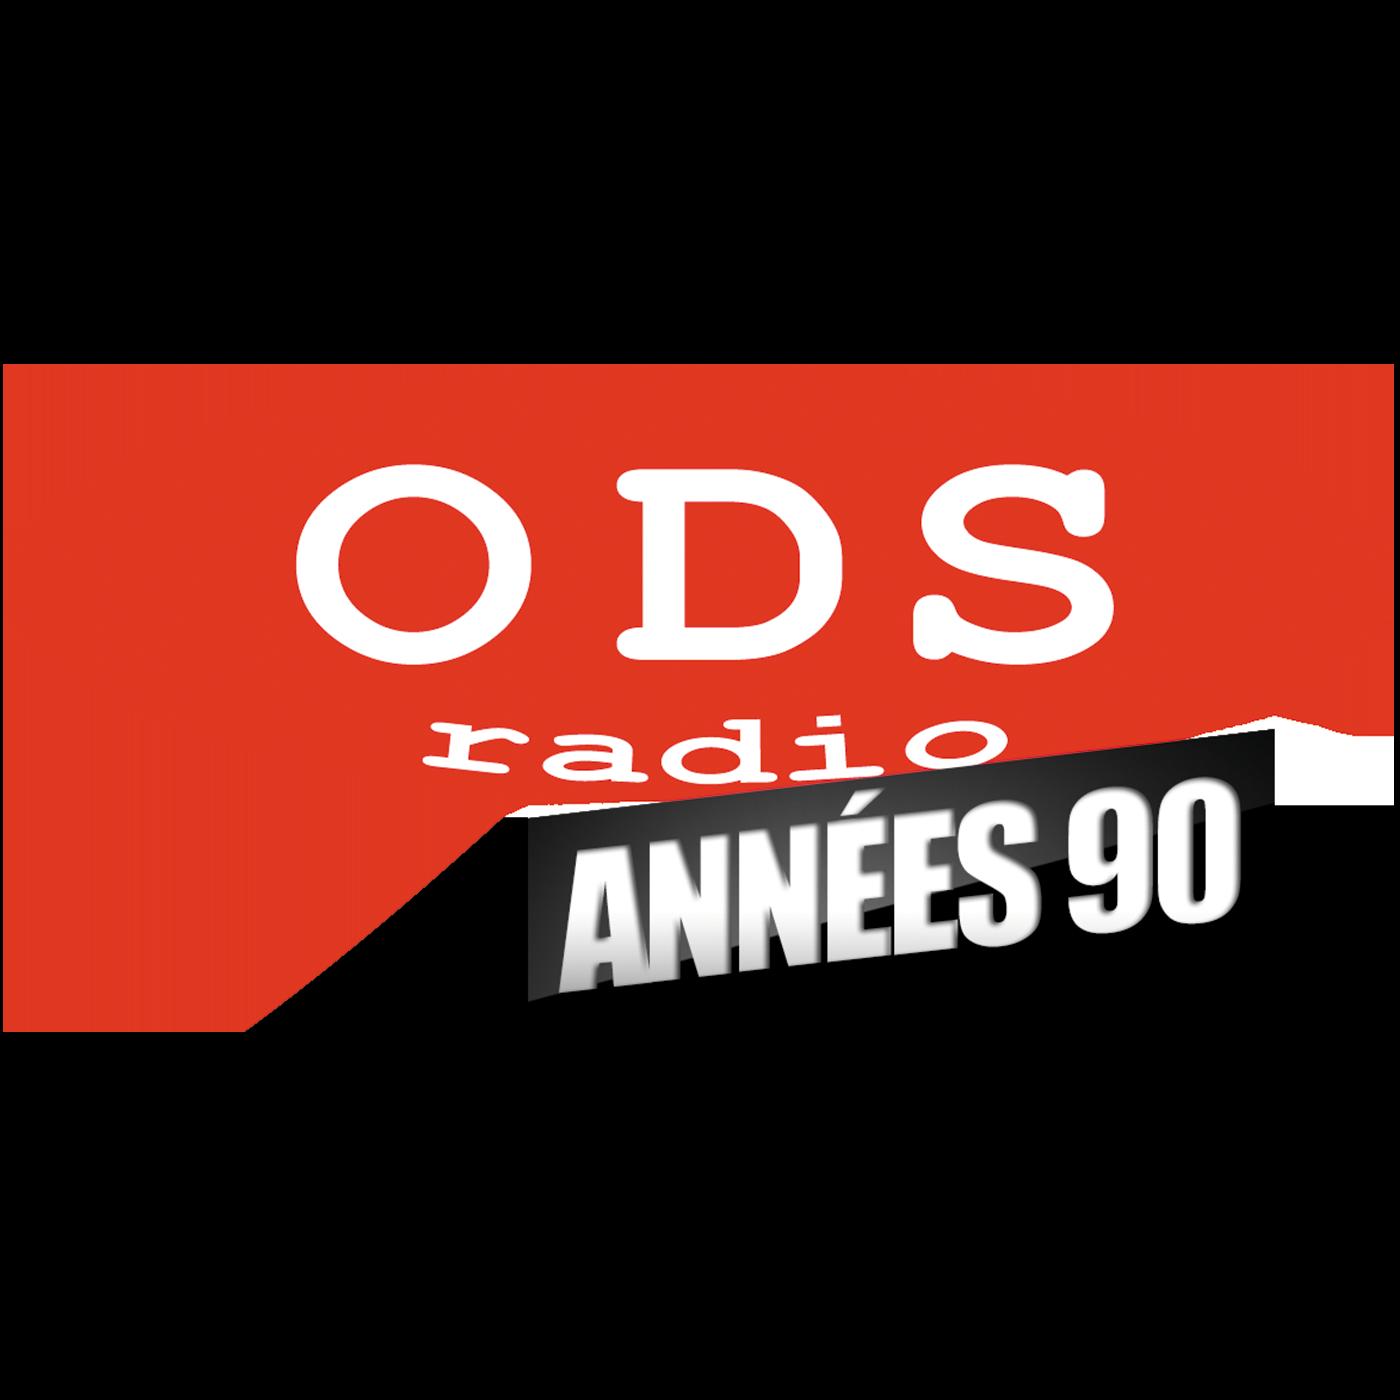 ODS - Années 90